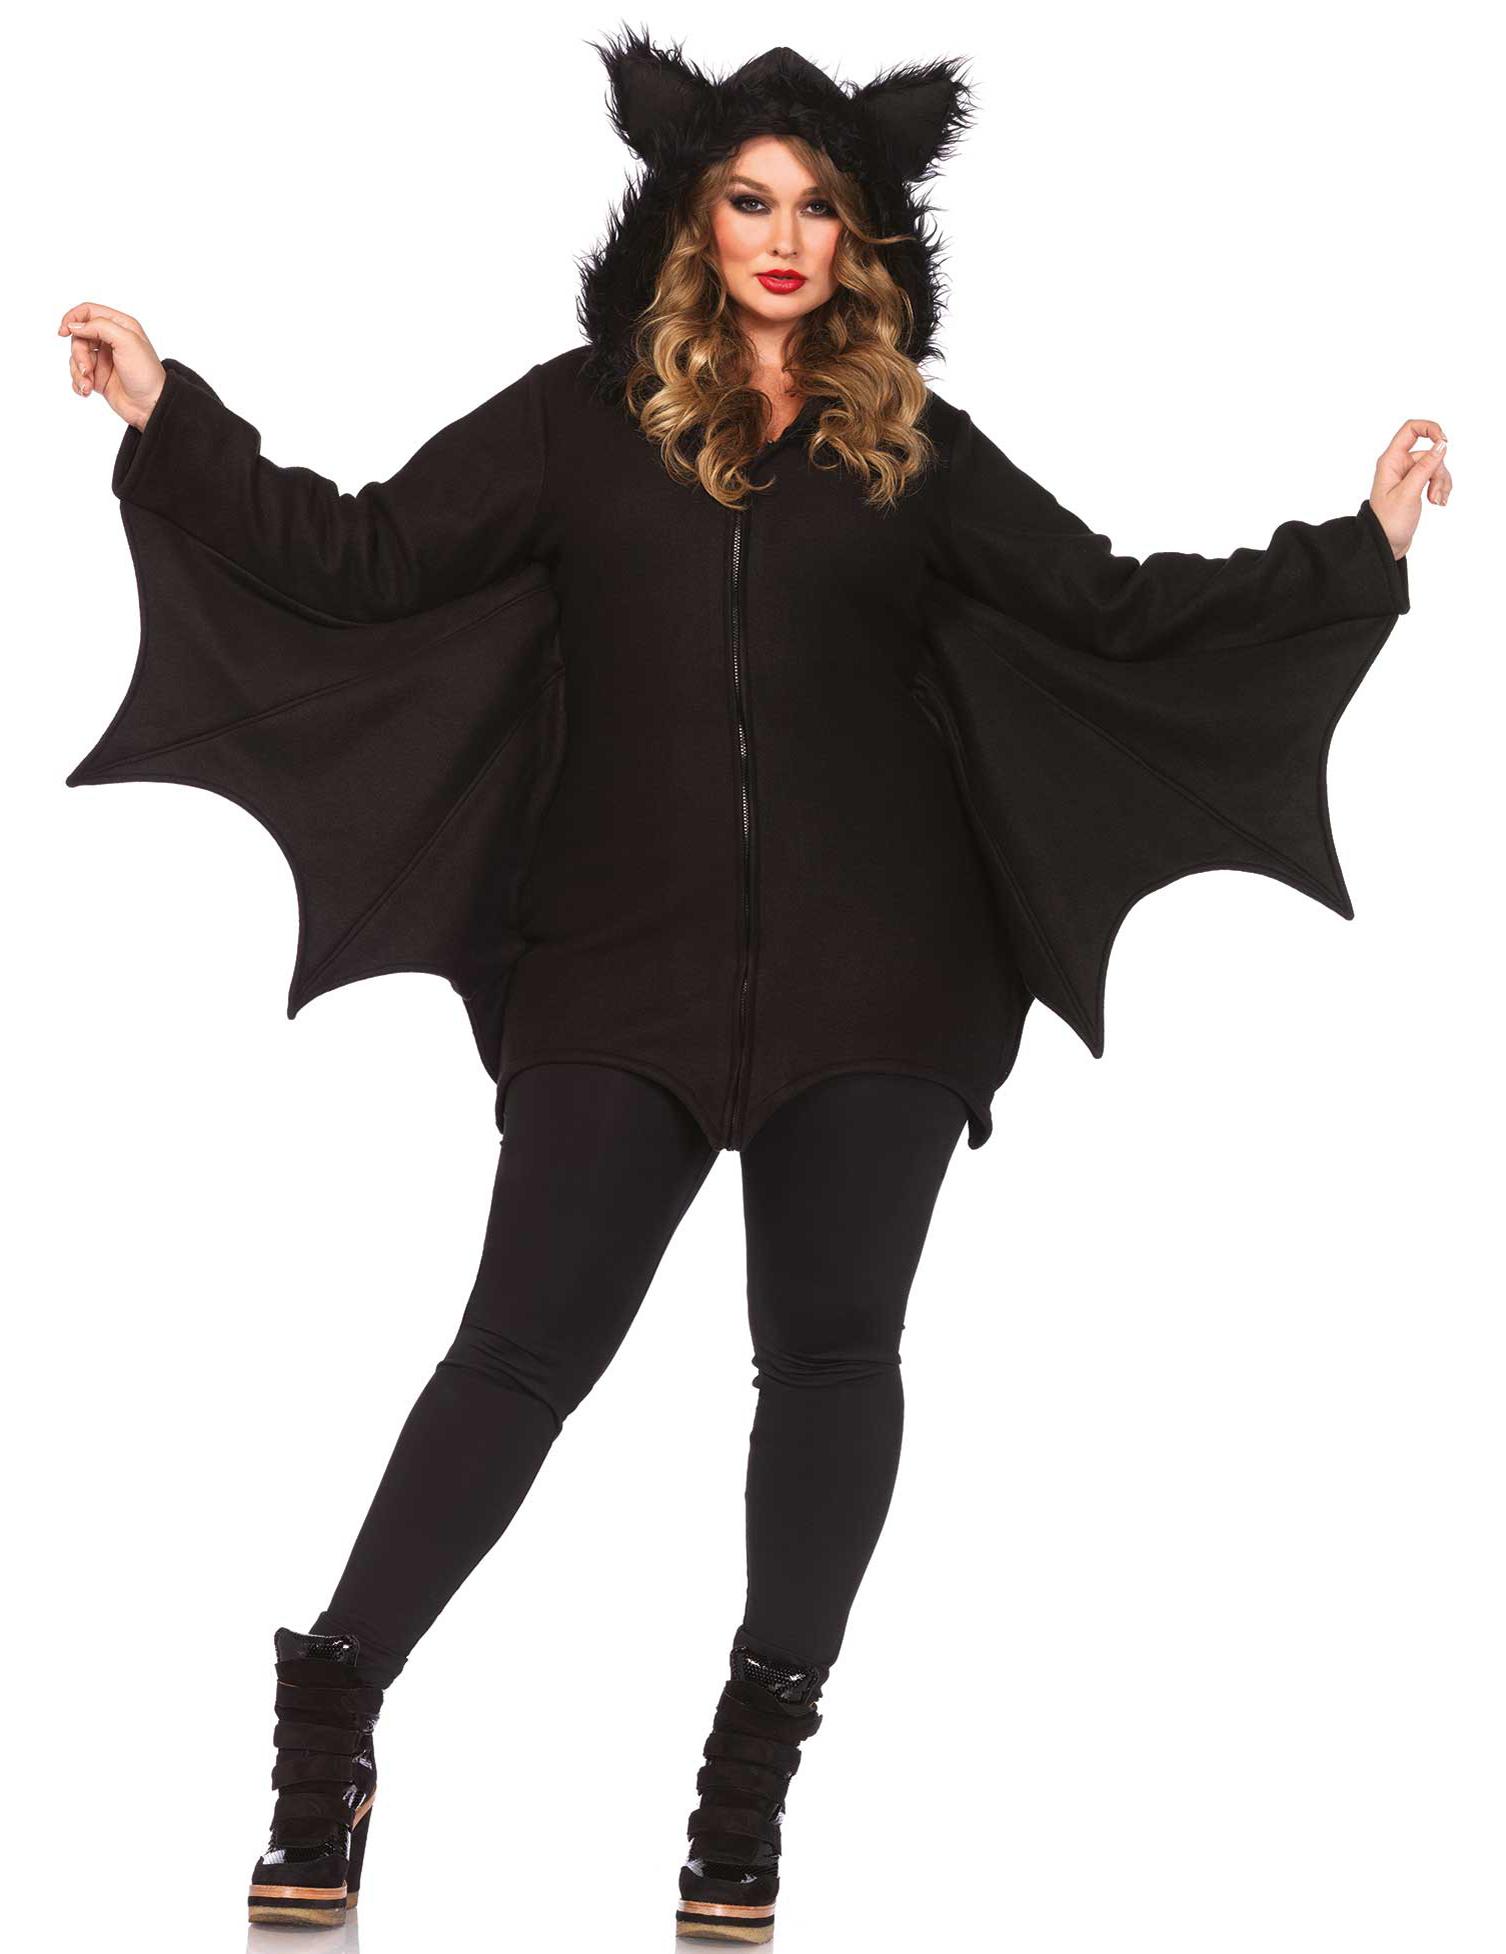 vleermuis kostuum dames